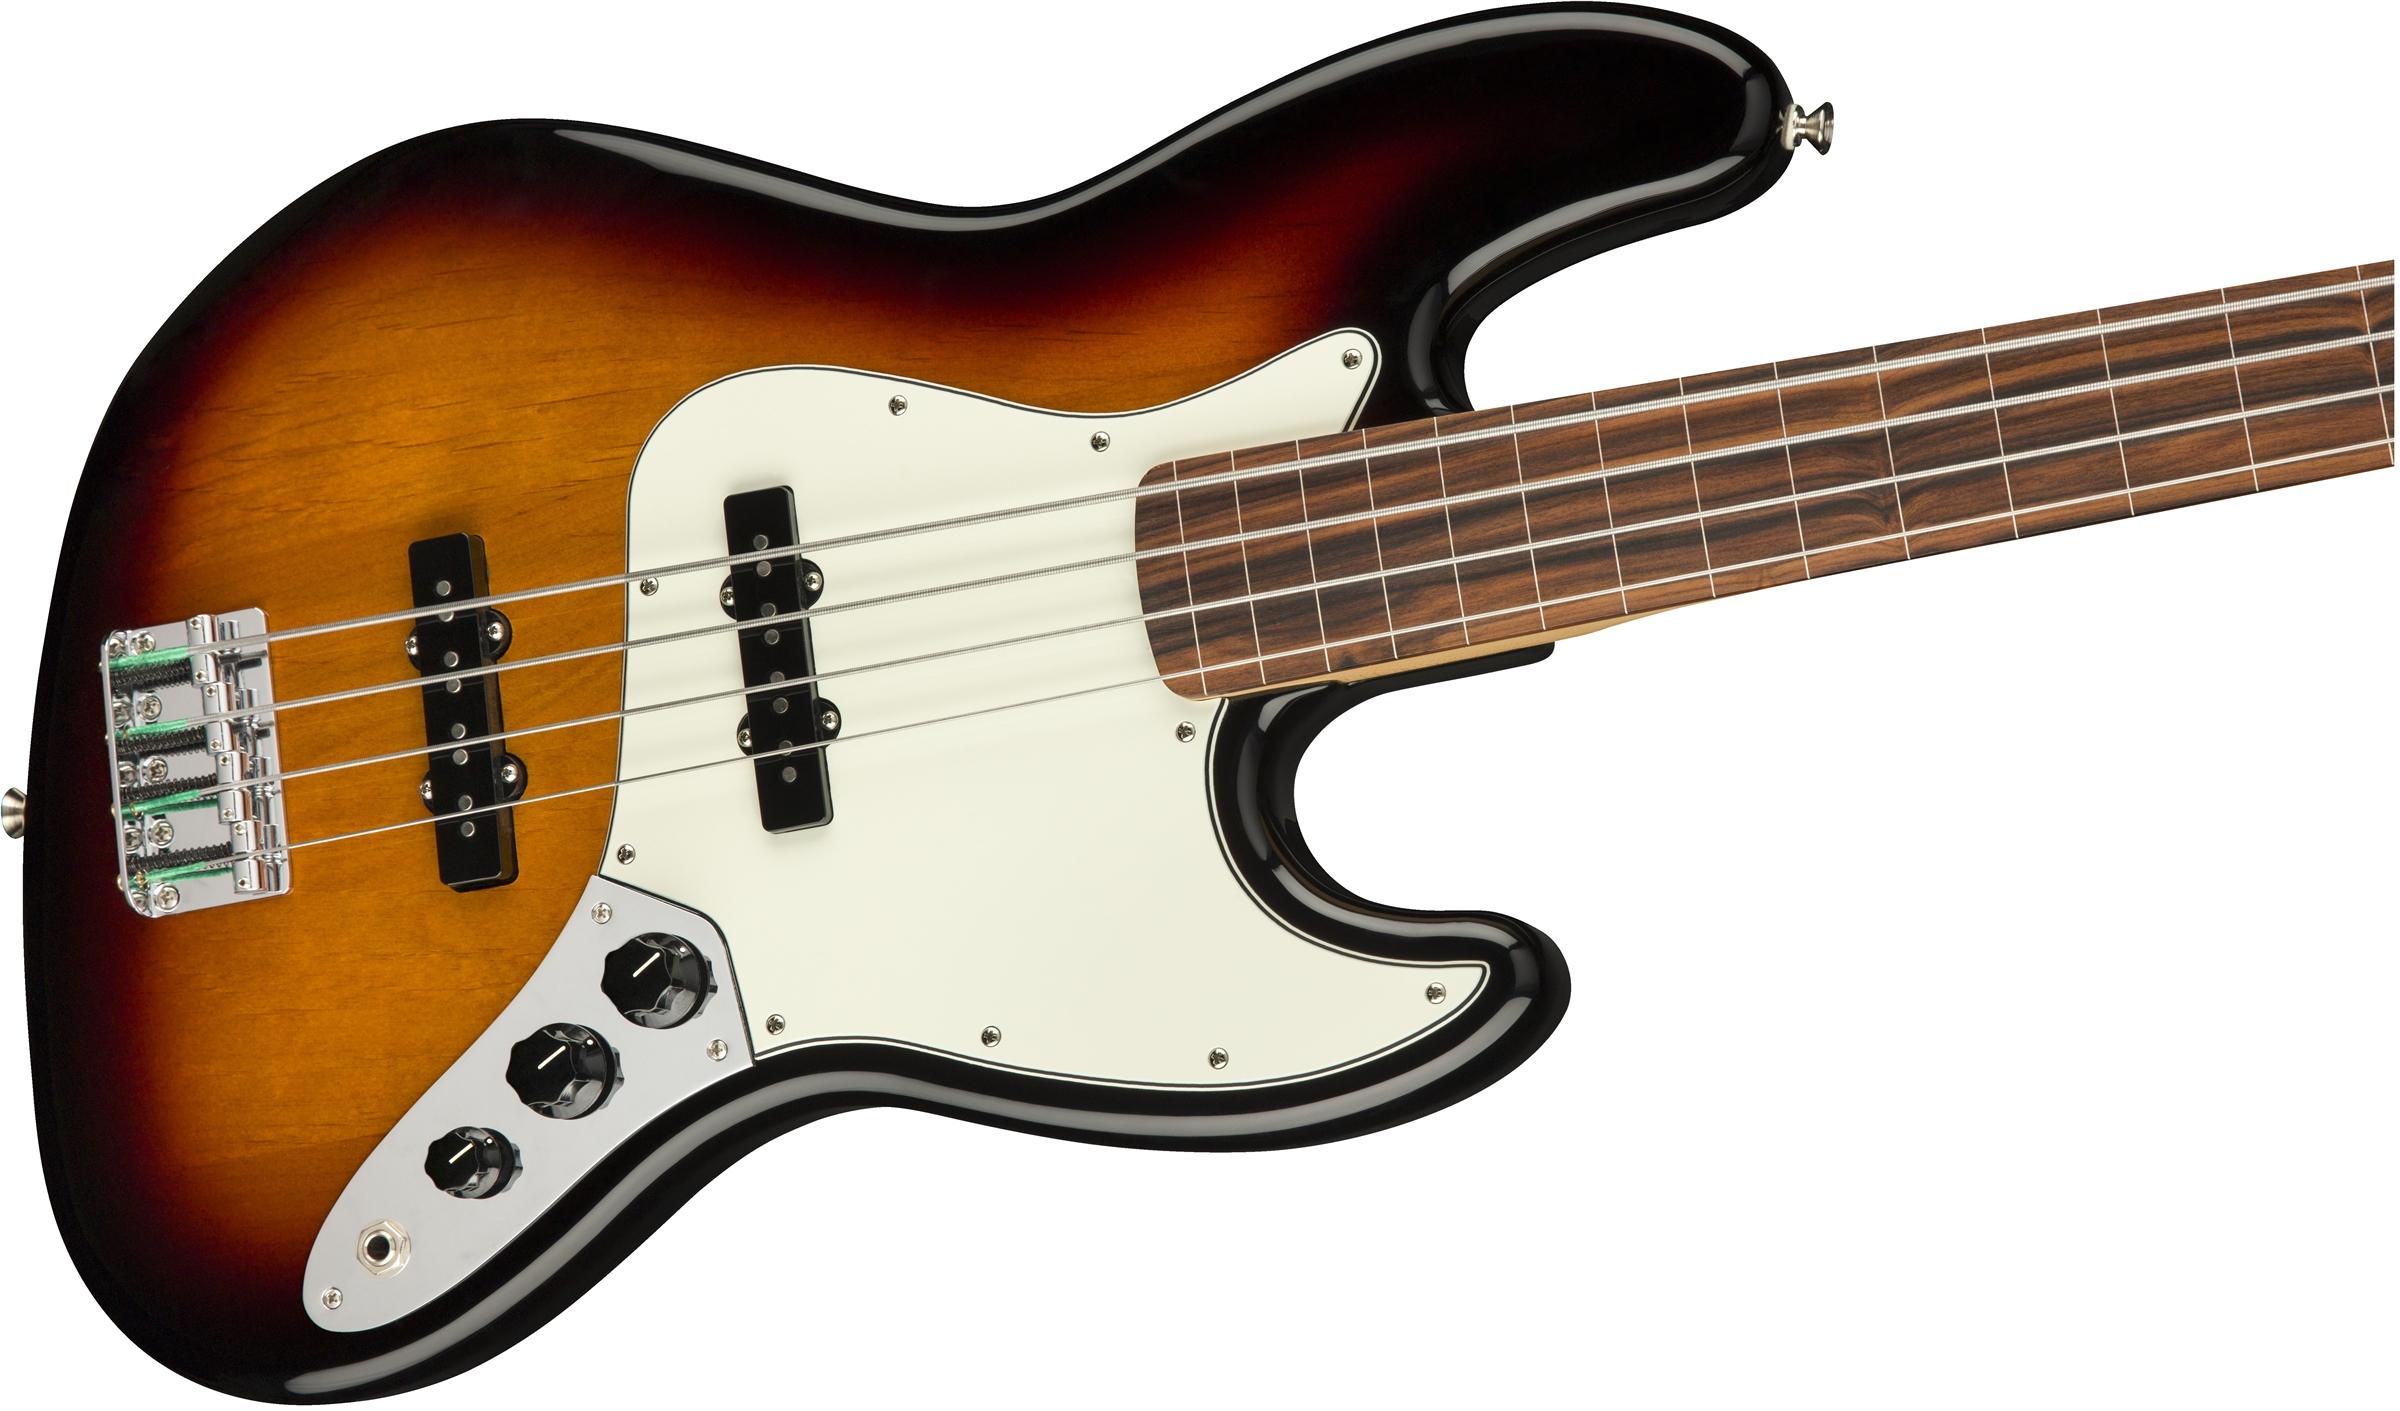 player jazz bass fretless electric basses. Black Bedroom Furniture Sets. Home Design Ideas